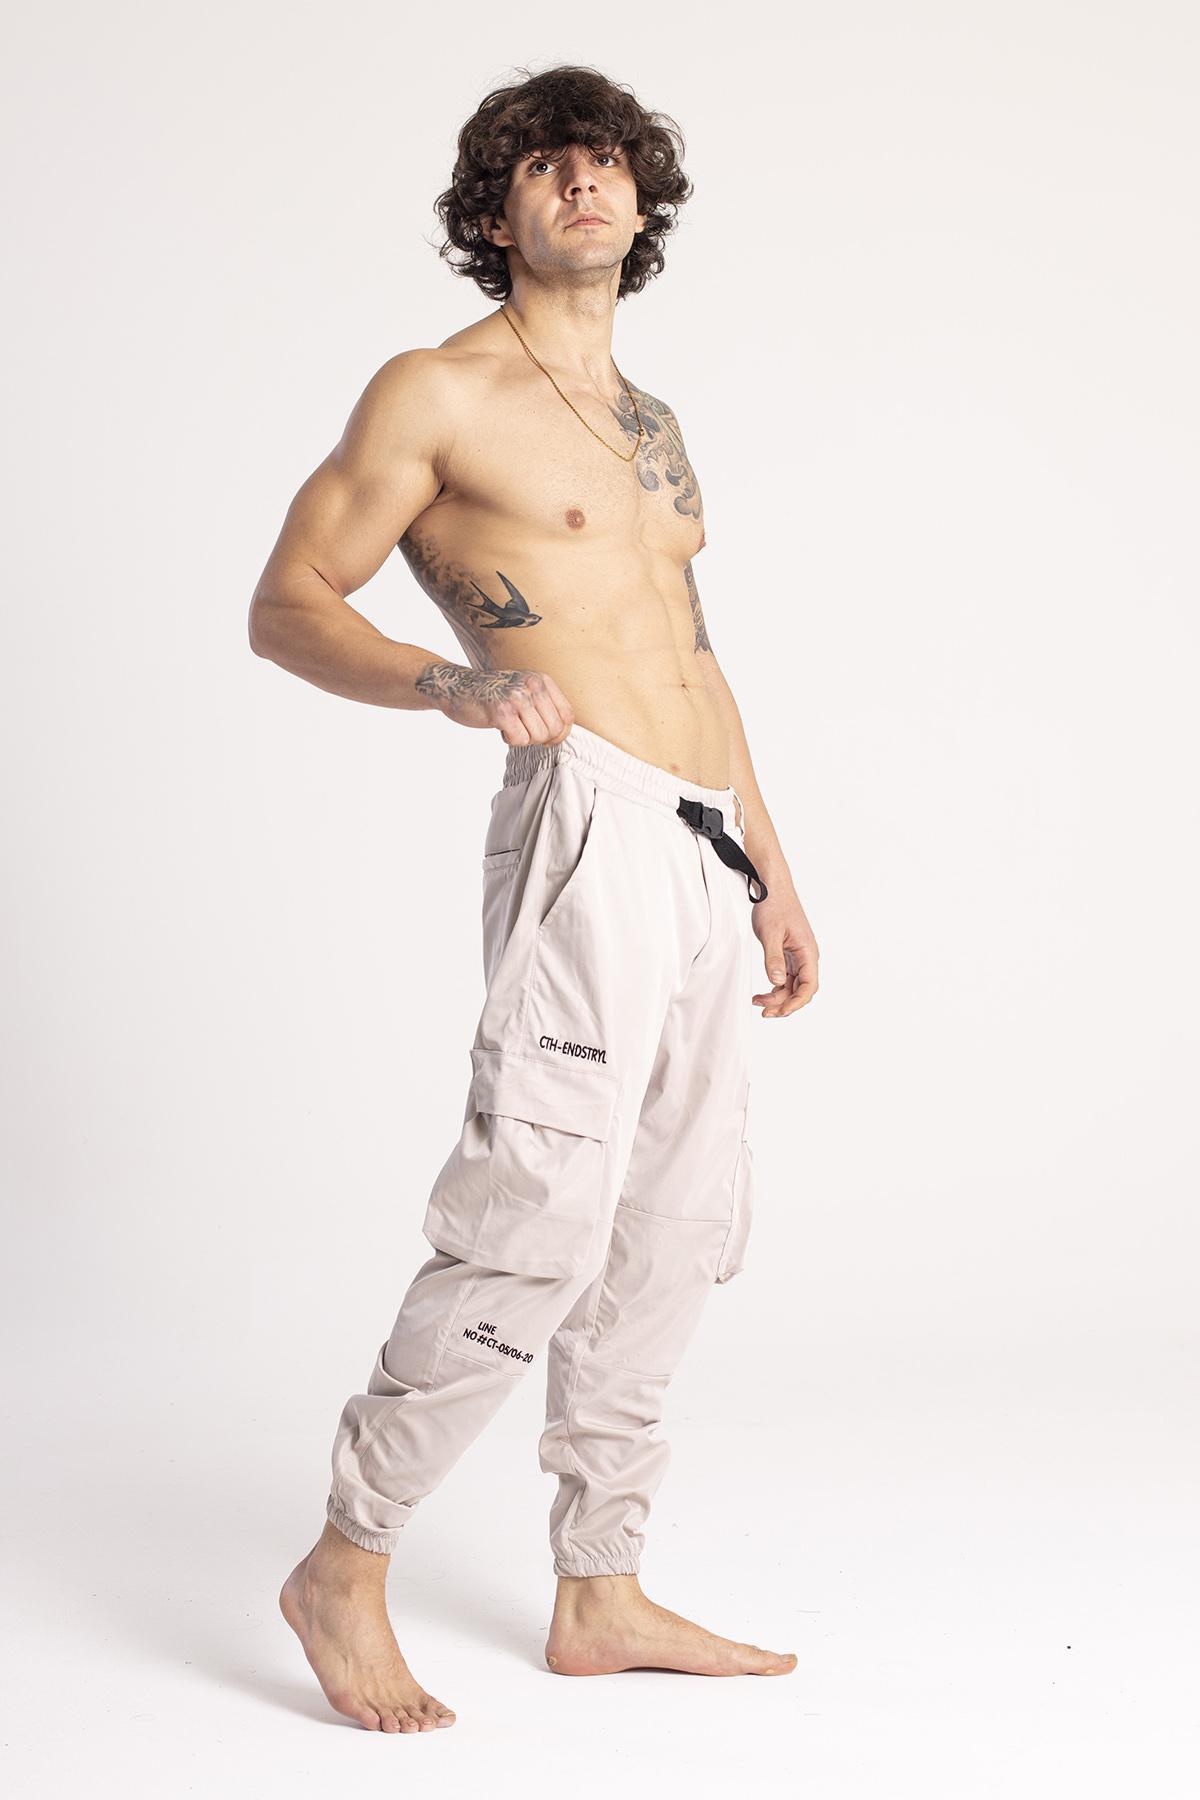 XHAN - Ekru Nakışlı Kargo Cep Jogger Pantolon 1KXE5-44674-52